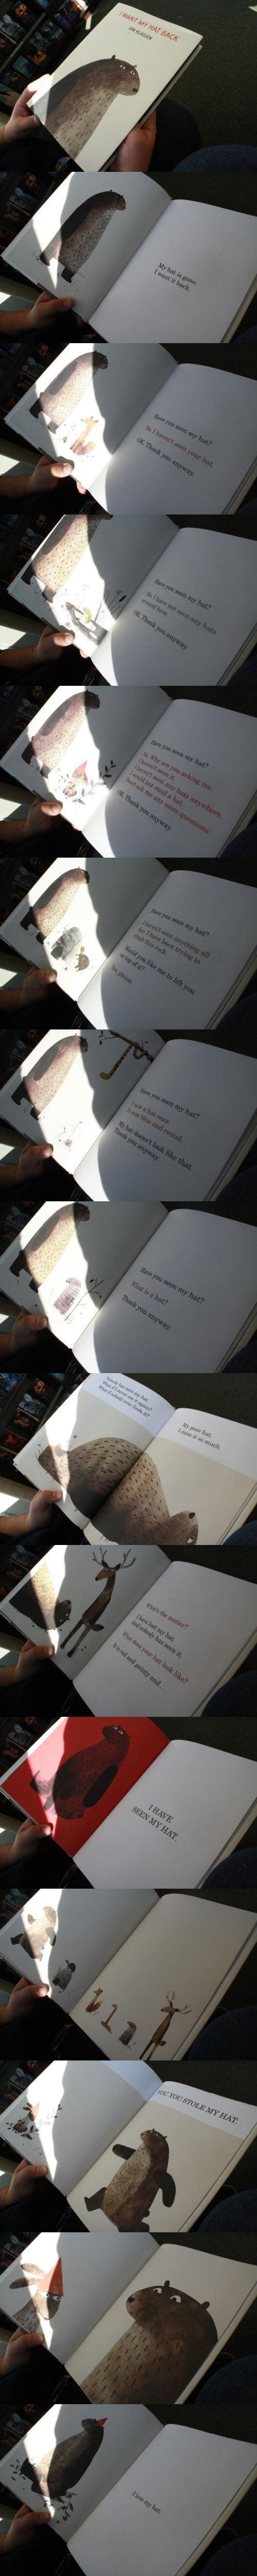 best book ever. . best book ever